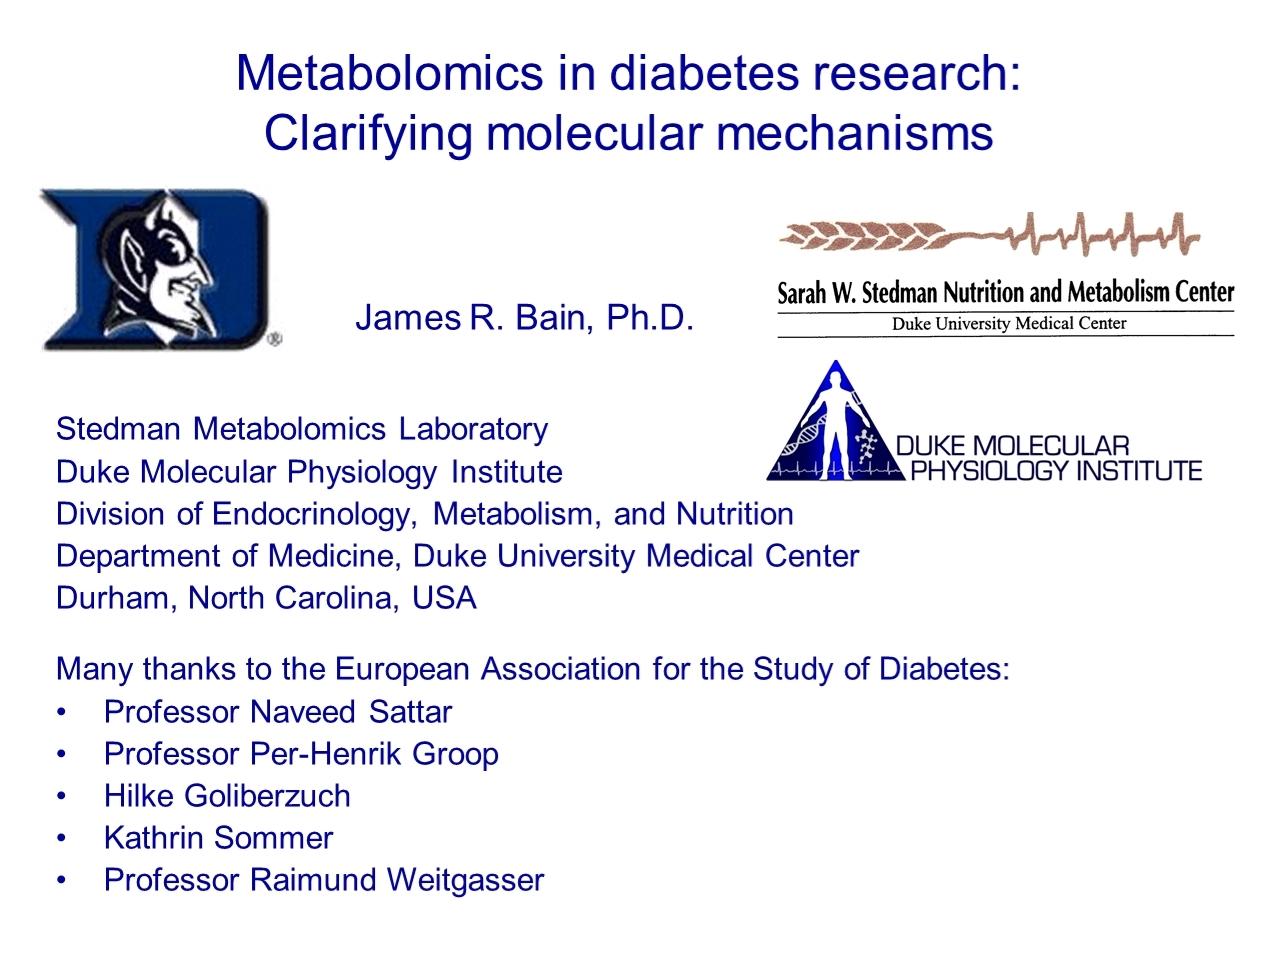 Metabolomics in diabetes research: clarifying molecular